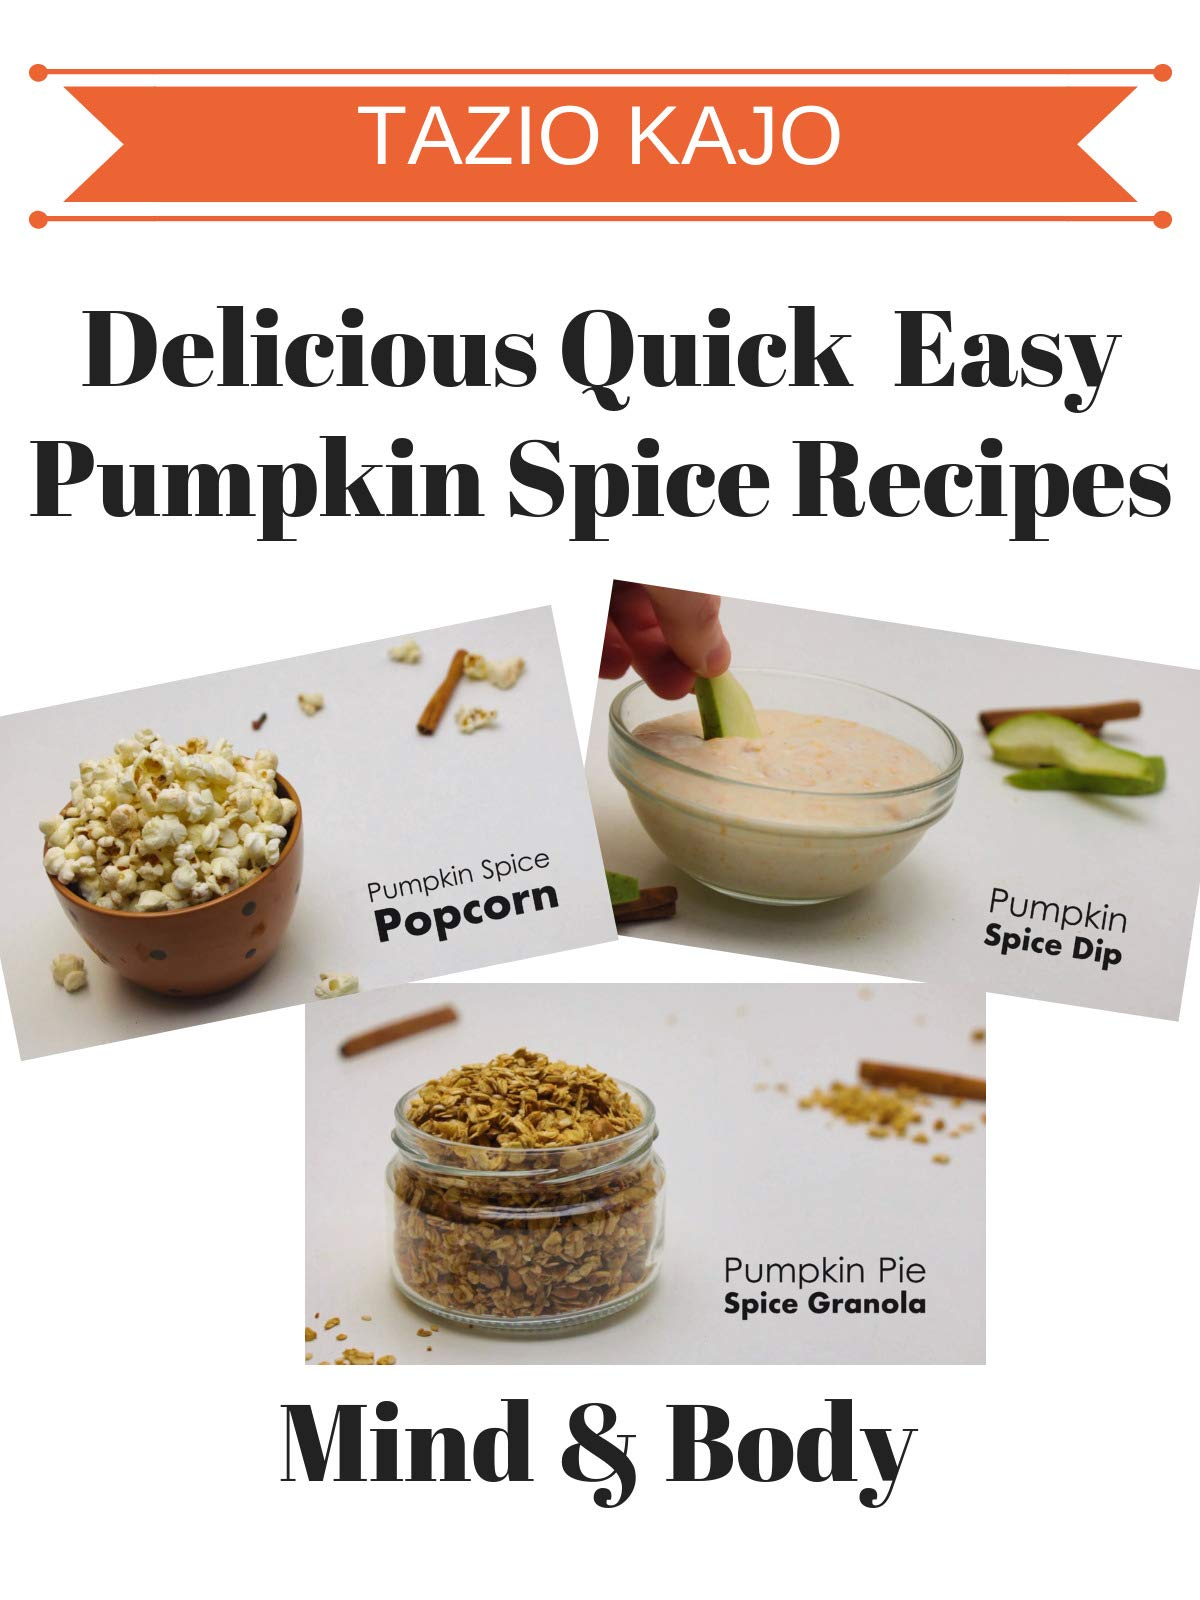 Delicious Quick & Easy Pumpkin Spice Recipes